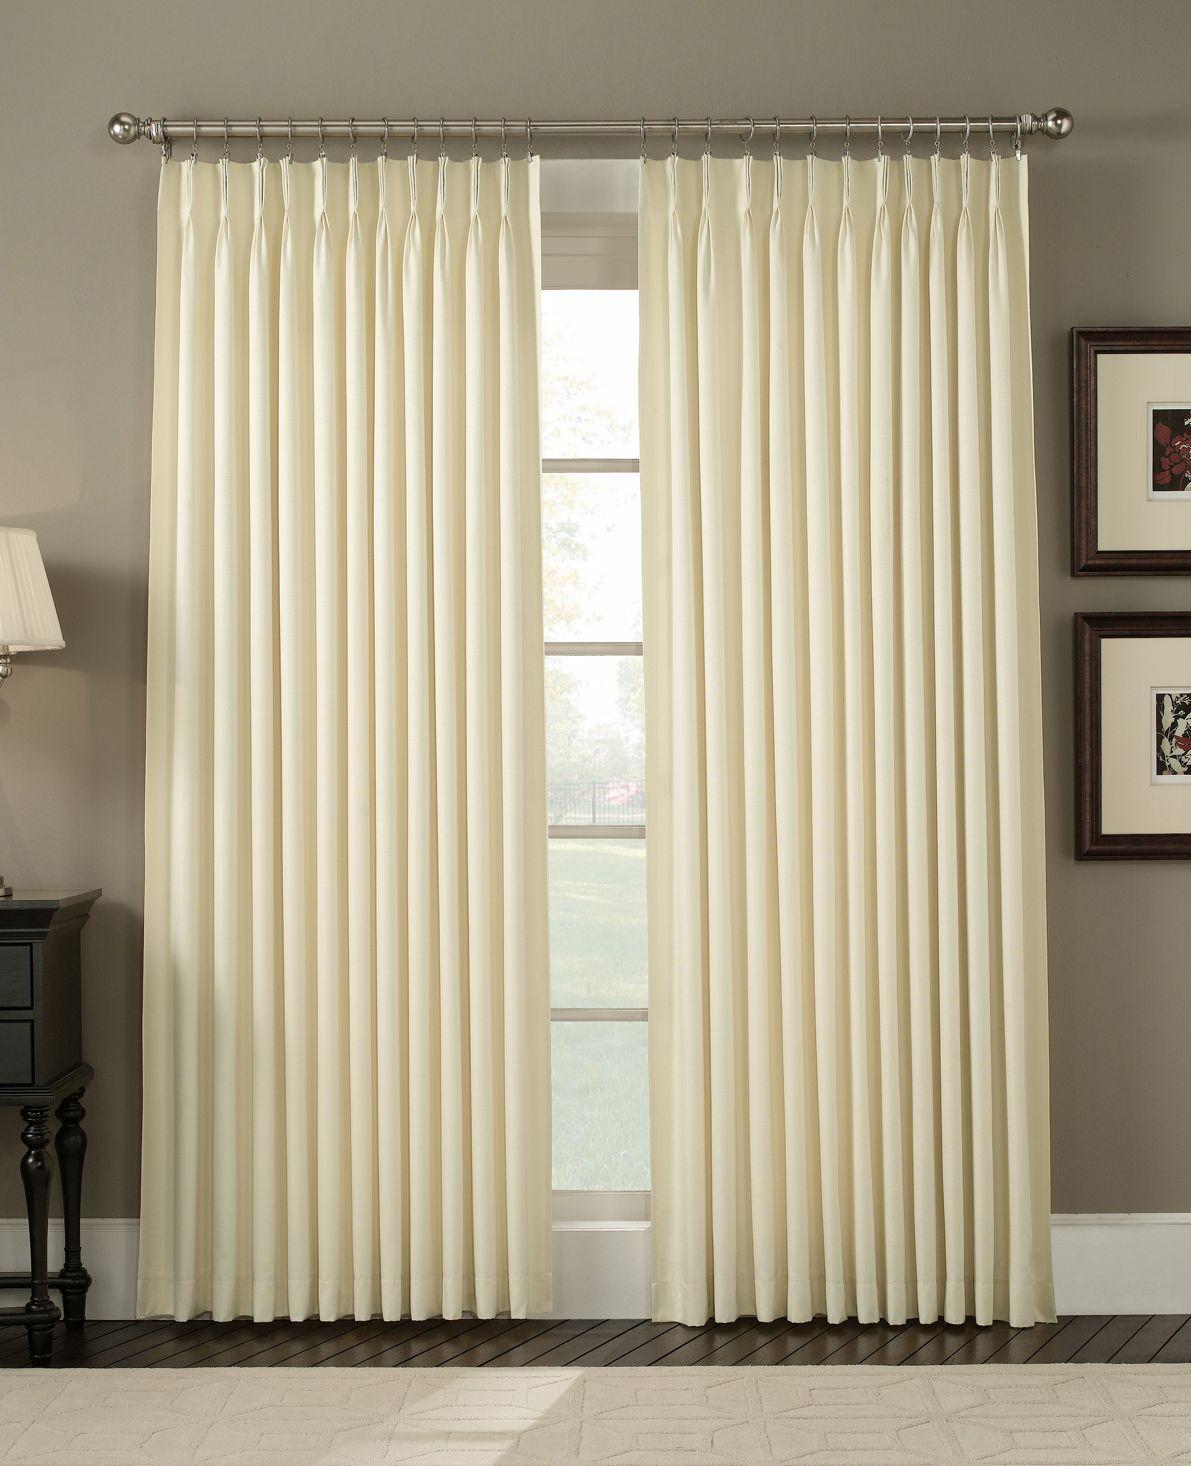 Designers Curtains For Living Room Inspiration Image Result For Curtain Designs For Living Room  Curtain Ideas Decorating Design